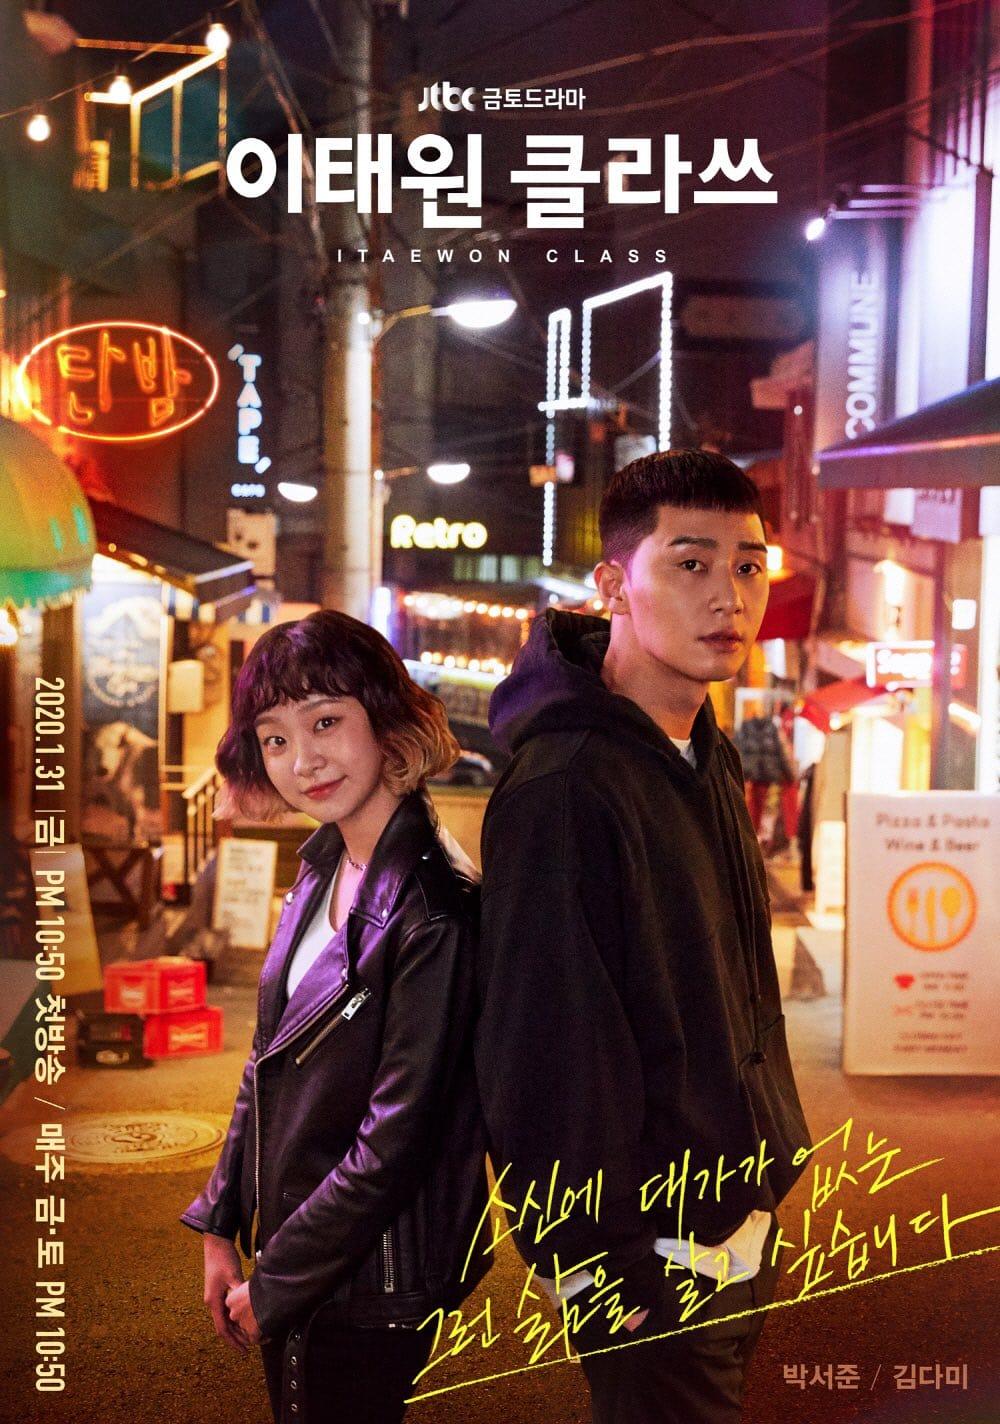 Drama Korea Itaewon Class 2020: Profil Pemeran Utama, Jadwal Tayang dan  Poster Drama | Kpop Squad Media | All about K-Pop and intermezzo